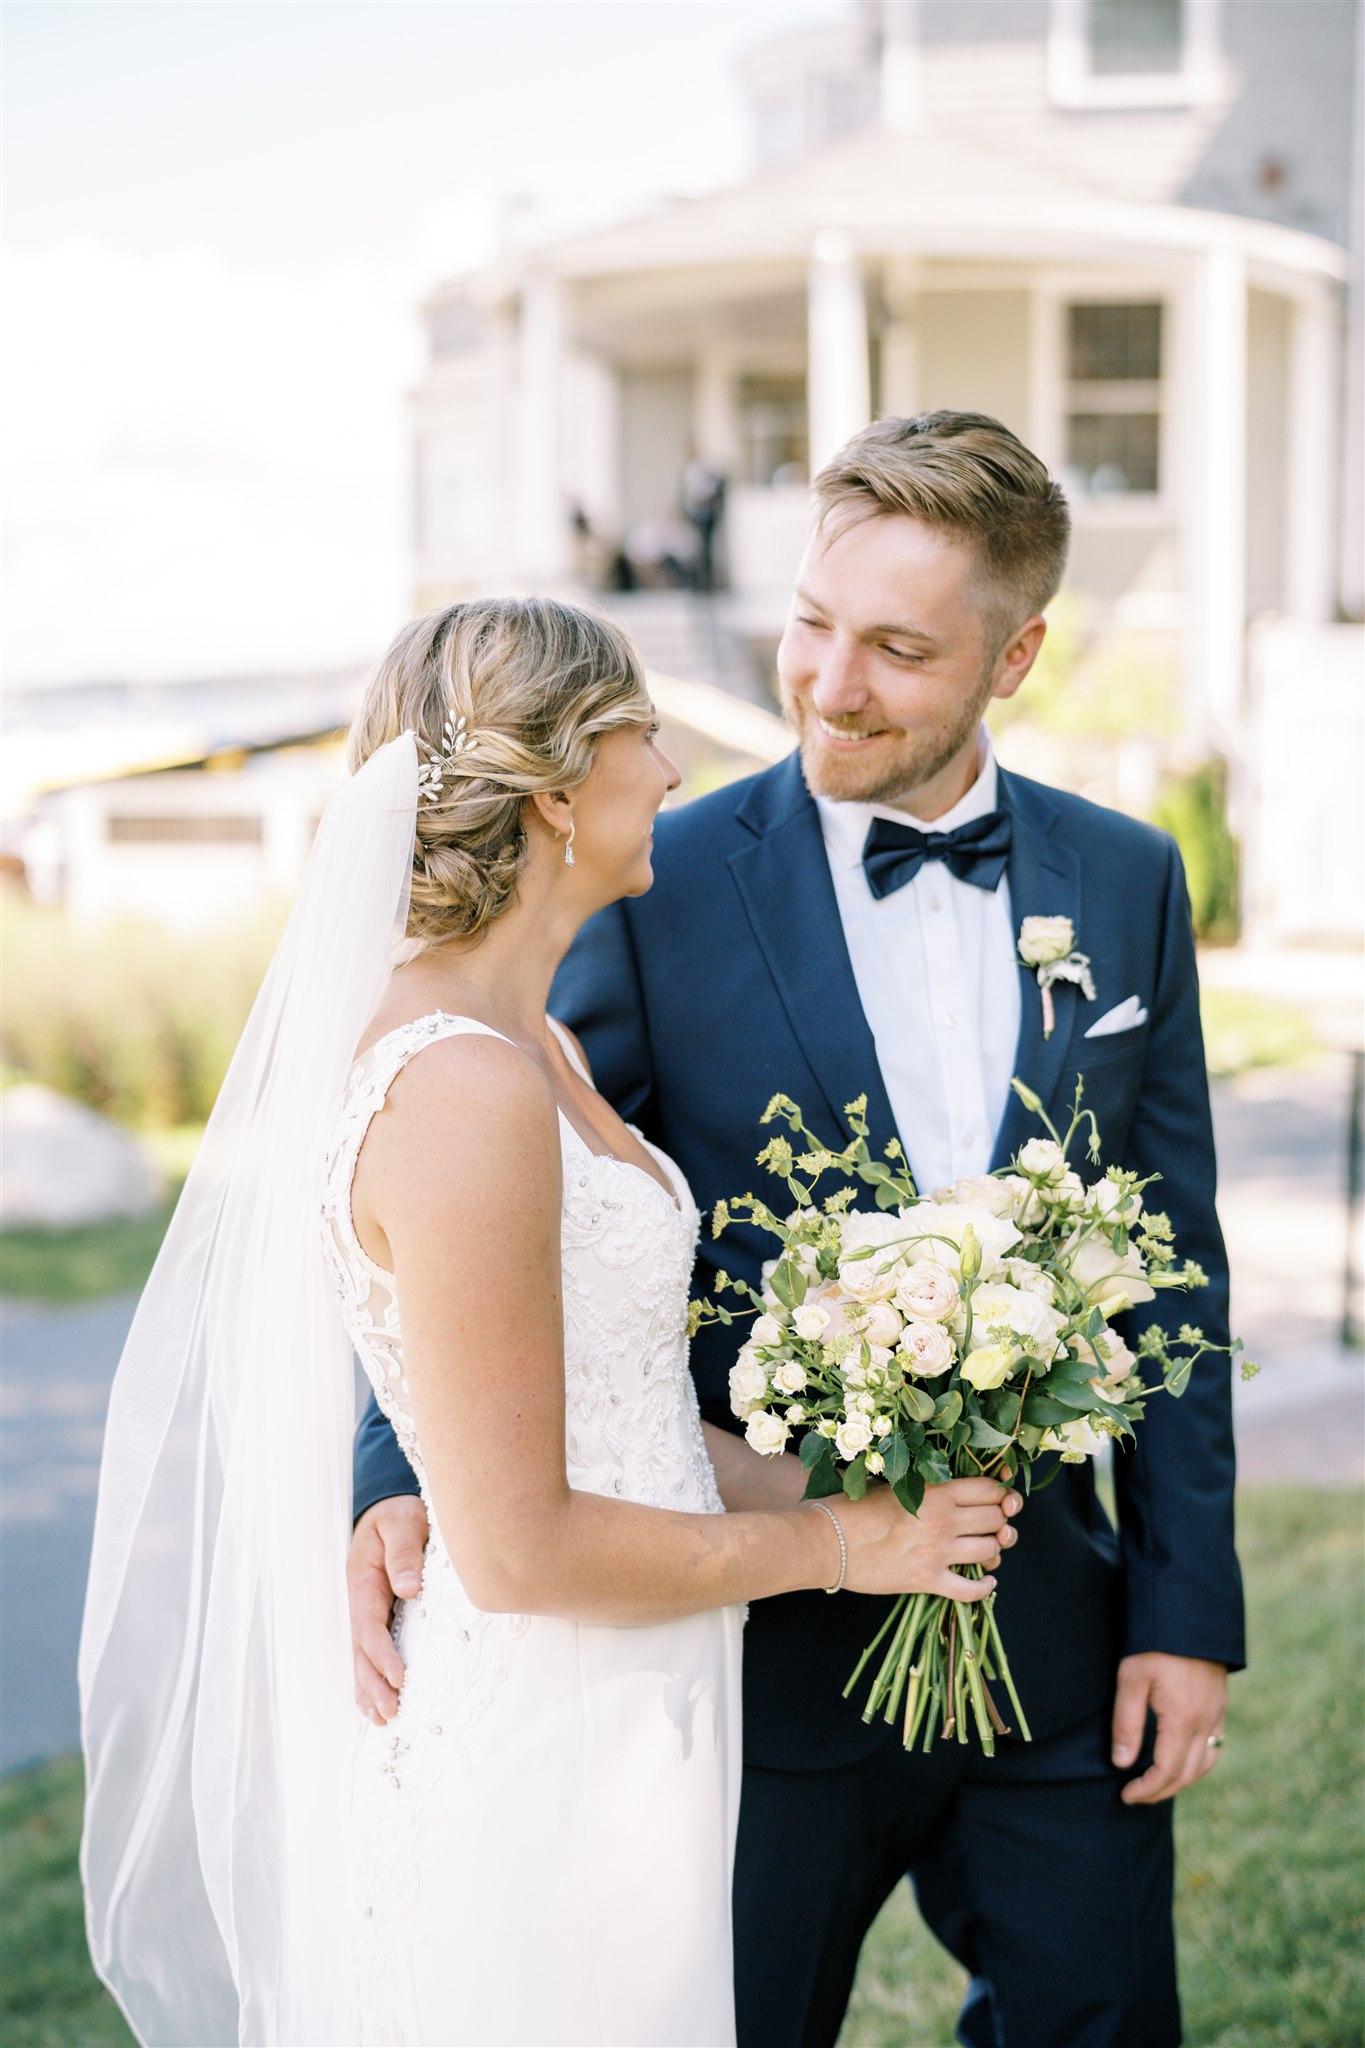 phot of bride and groom walking through the flower gardens at the Bar Harbor Inn